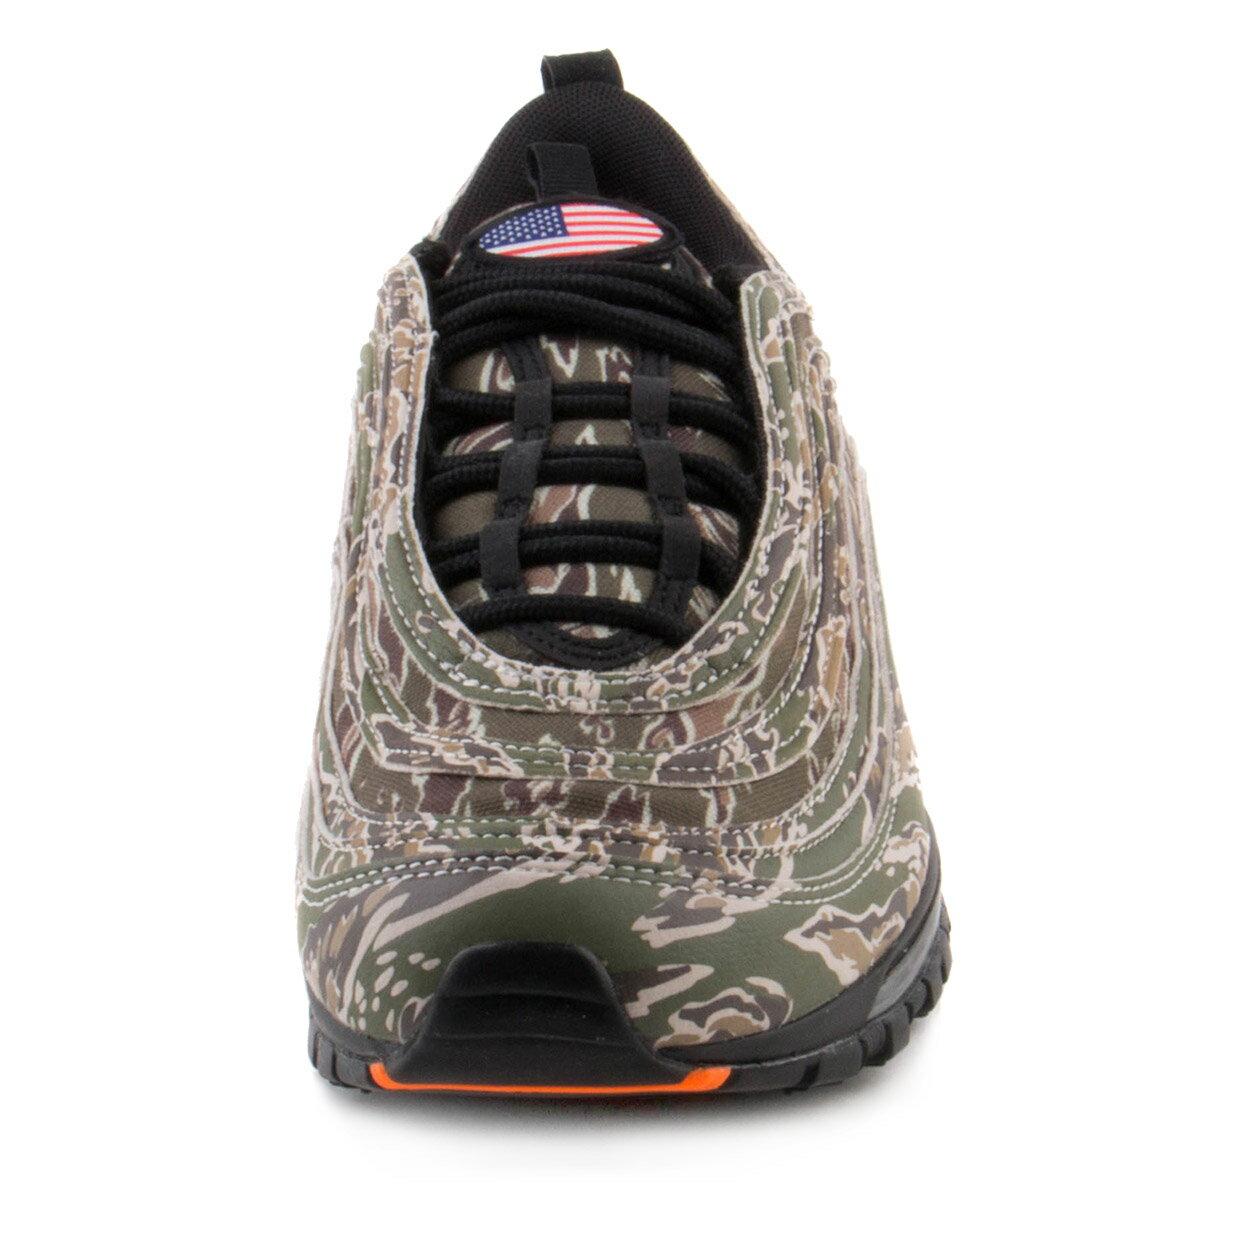 Sole-Unlimited  Nike Mens Air Max 97 Premium QS Country Camo